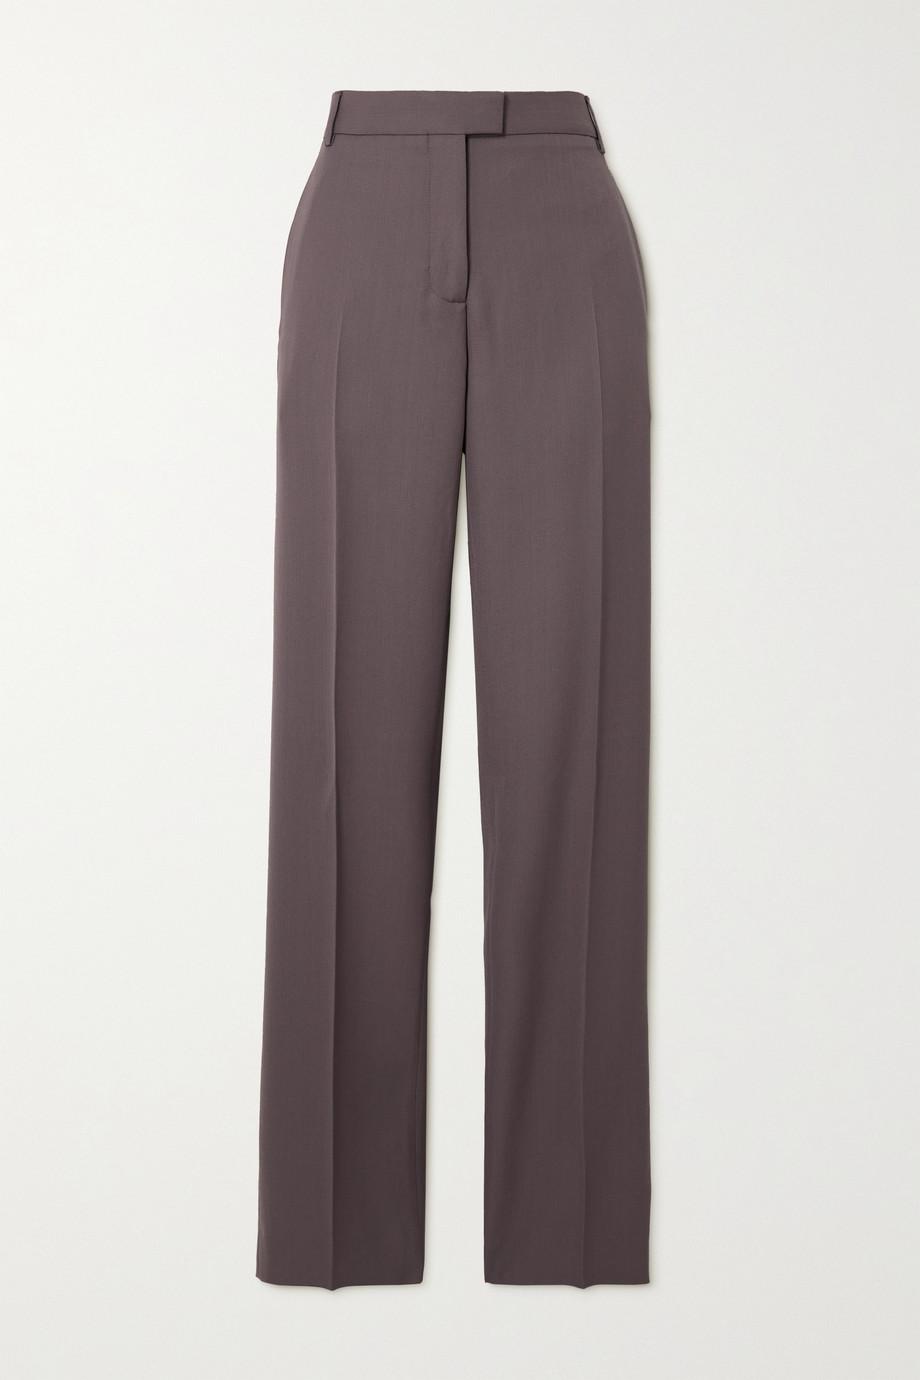 Acne Studios Pantalon droit tissé